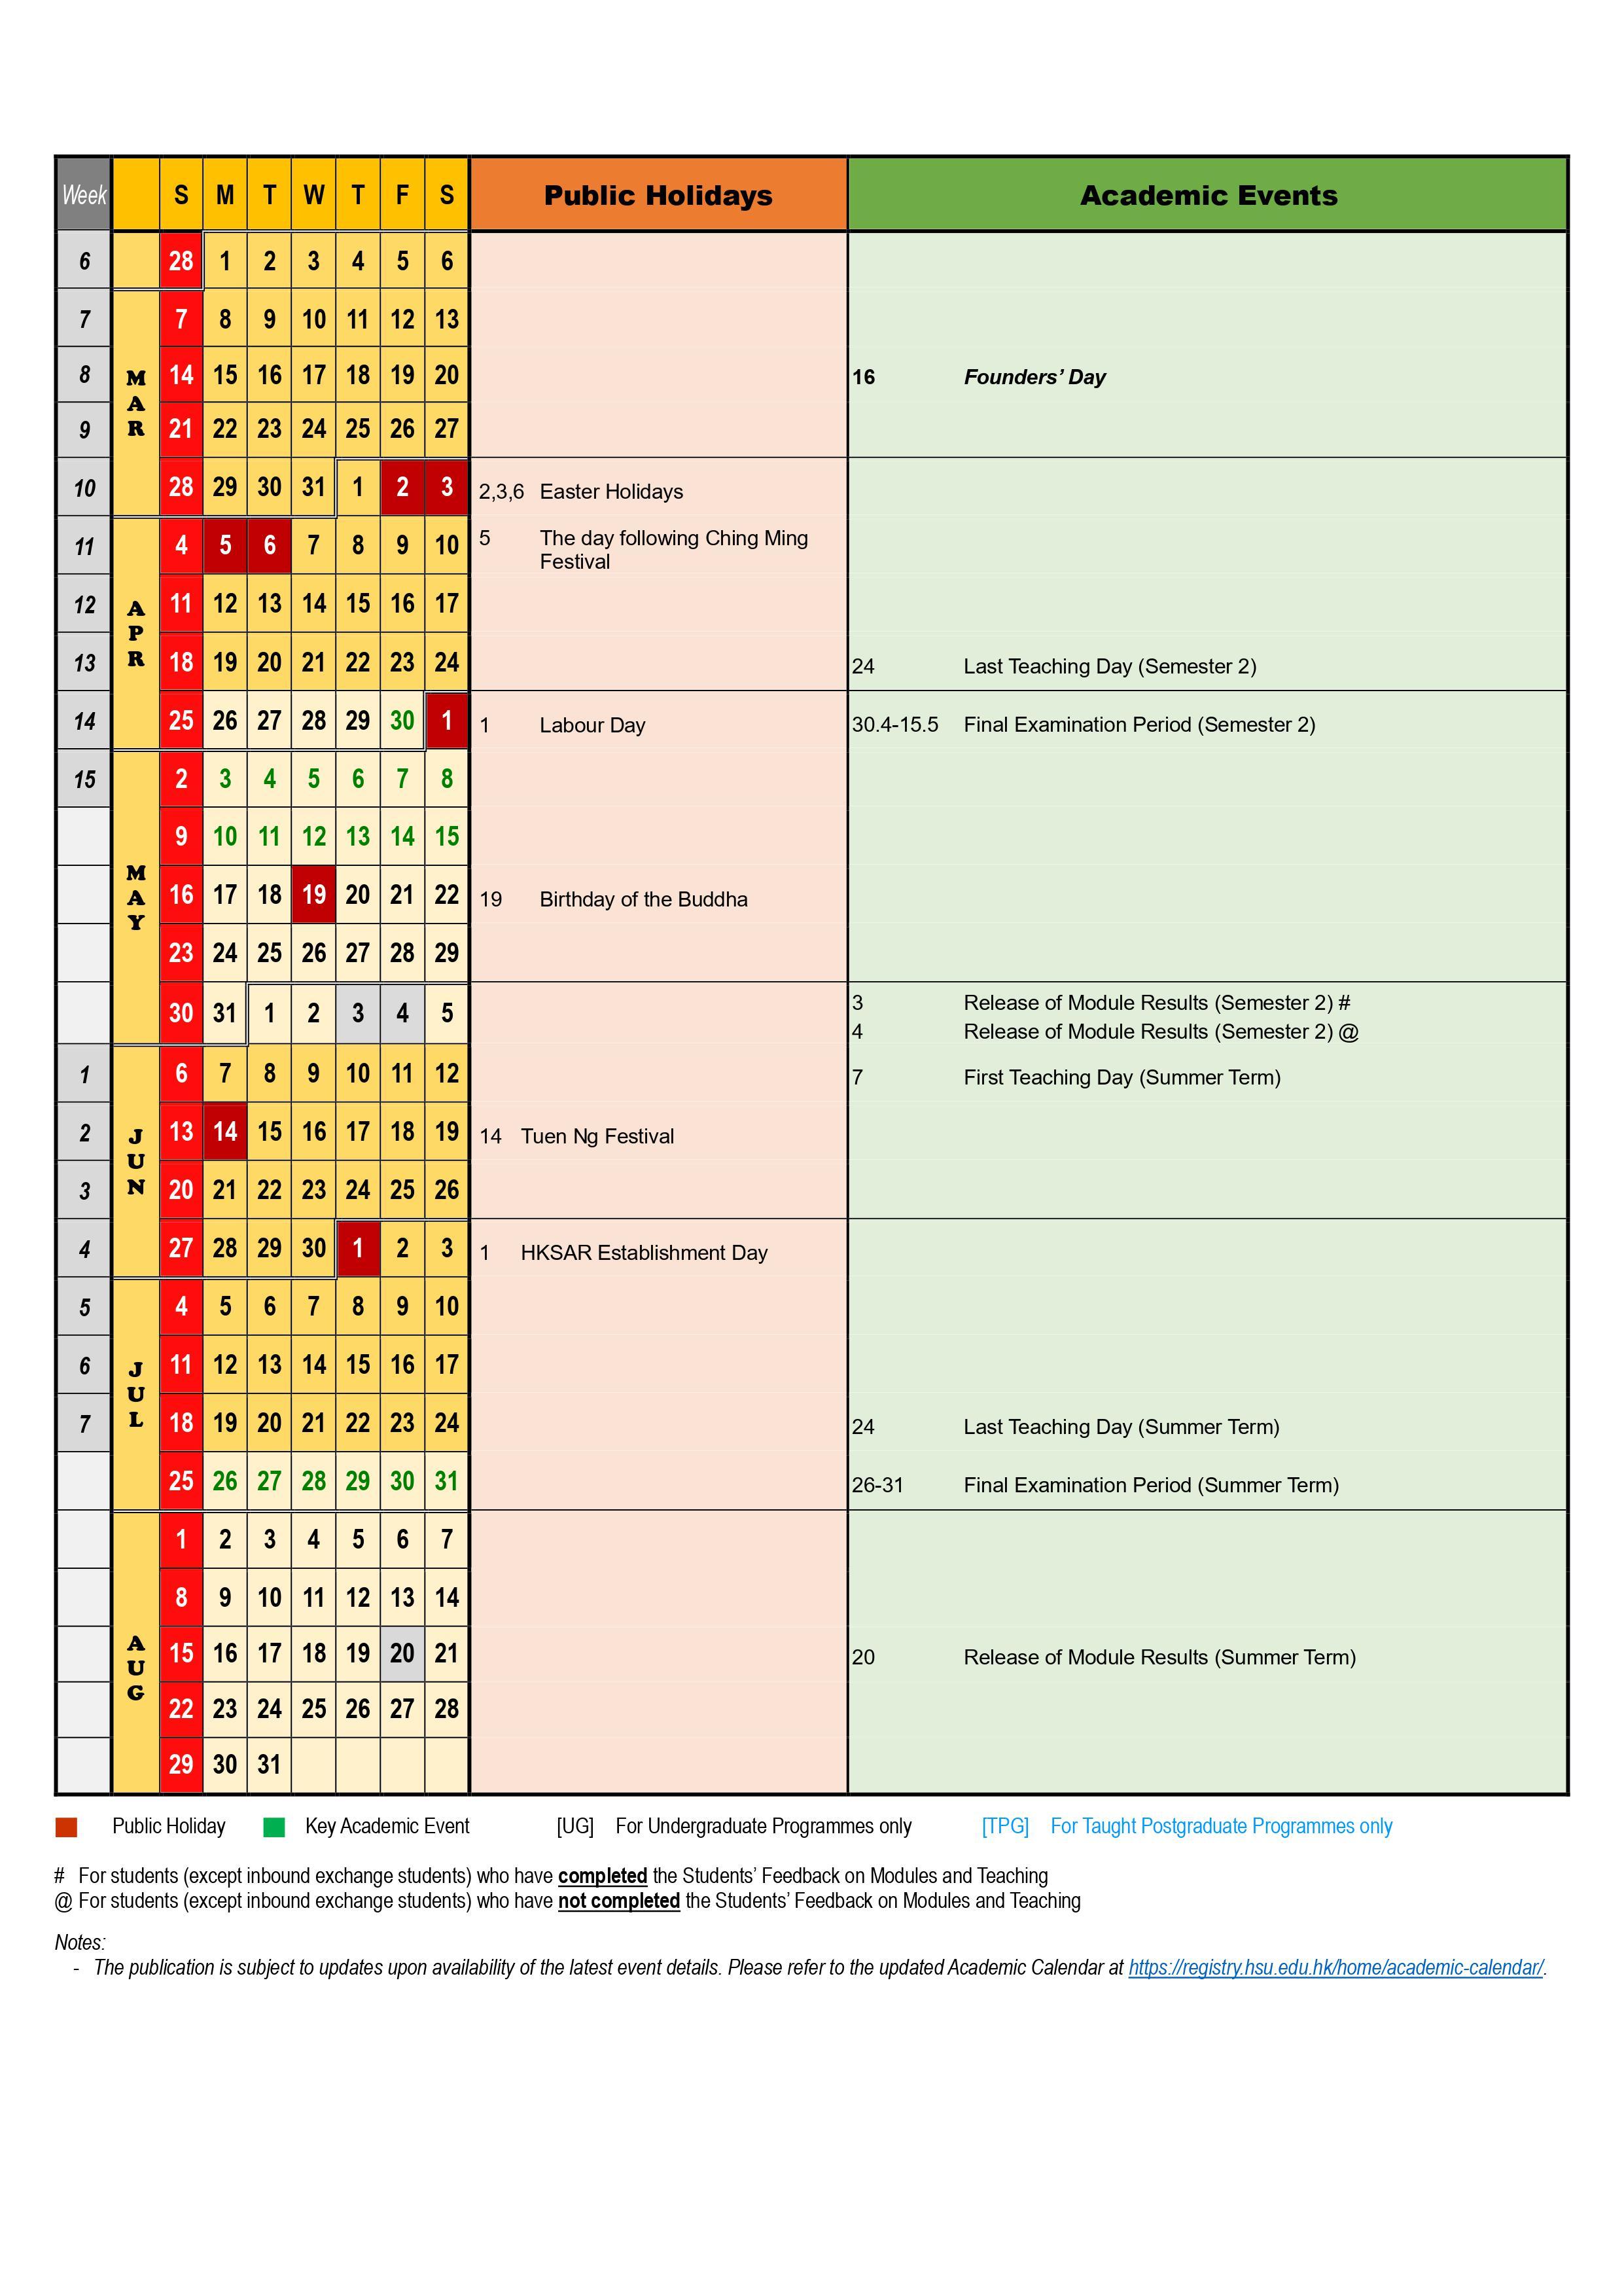 Academic Calendar 2020-21_20200630_02